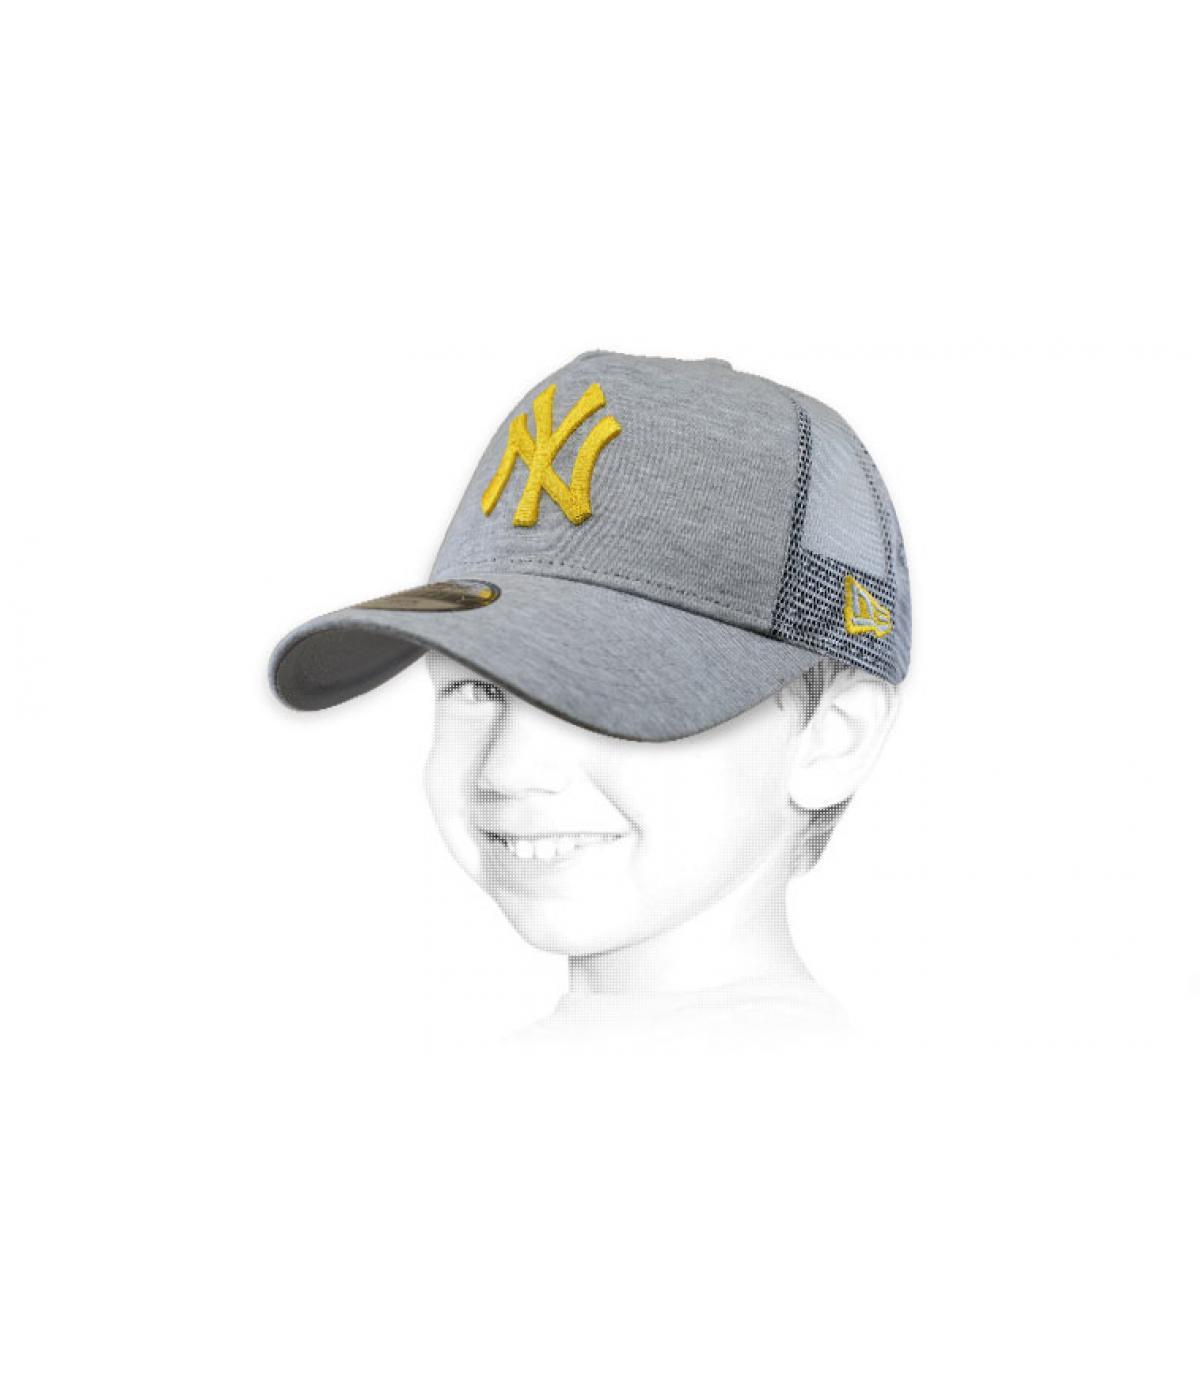 Kinder Trucker NY grau gelb